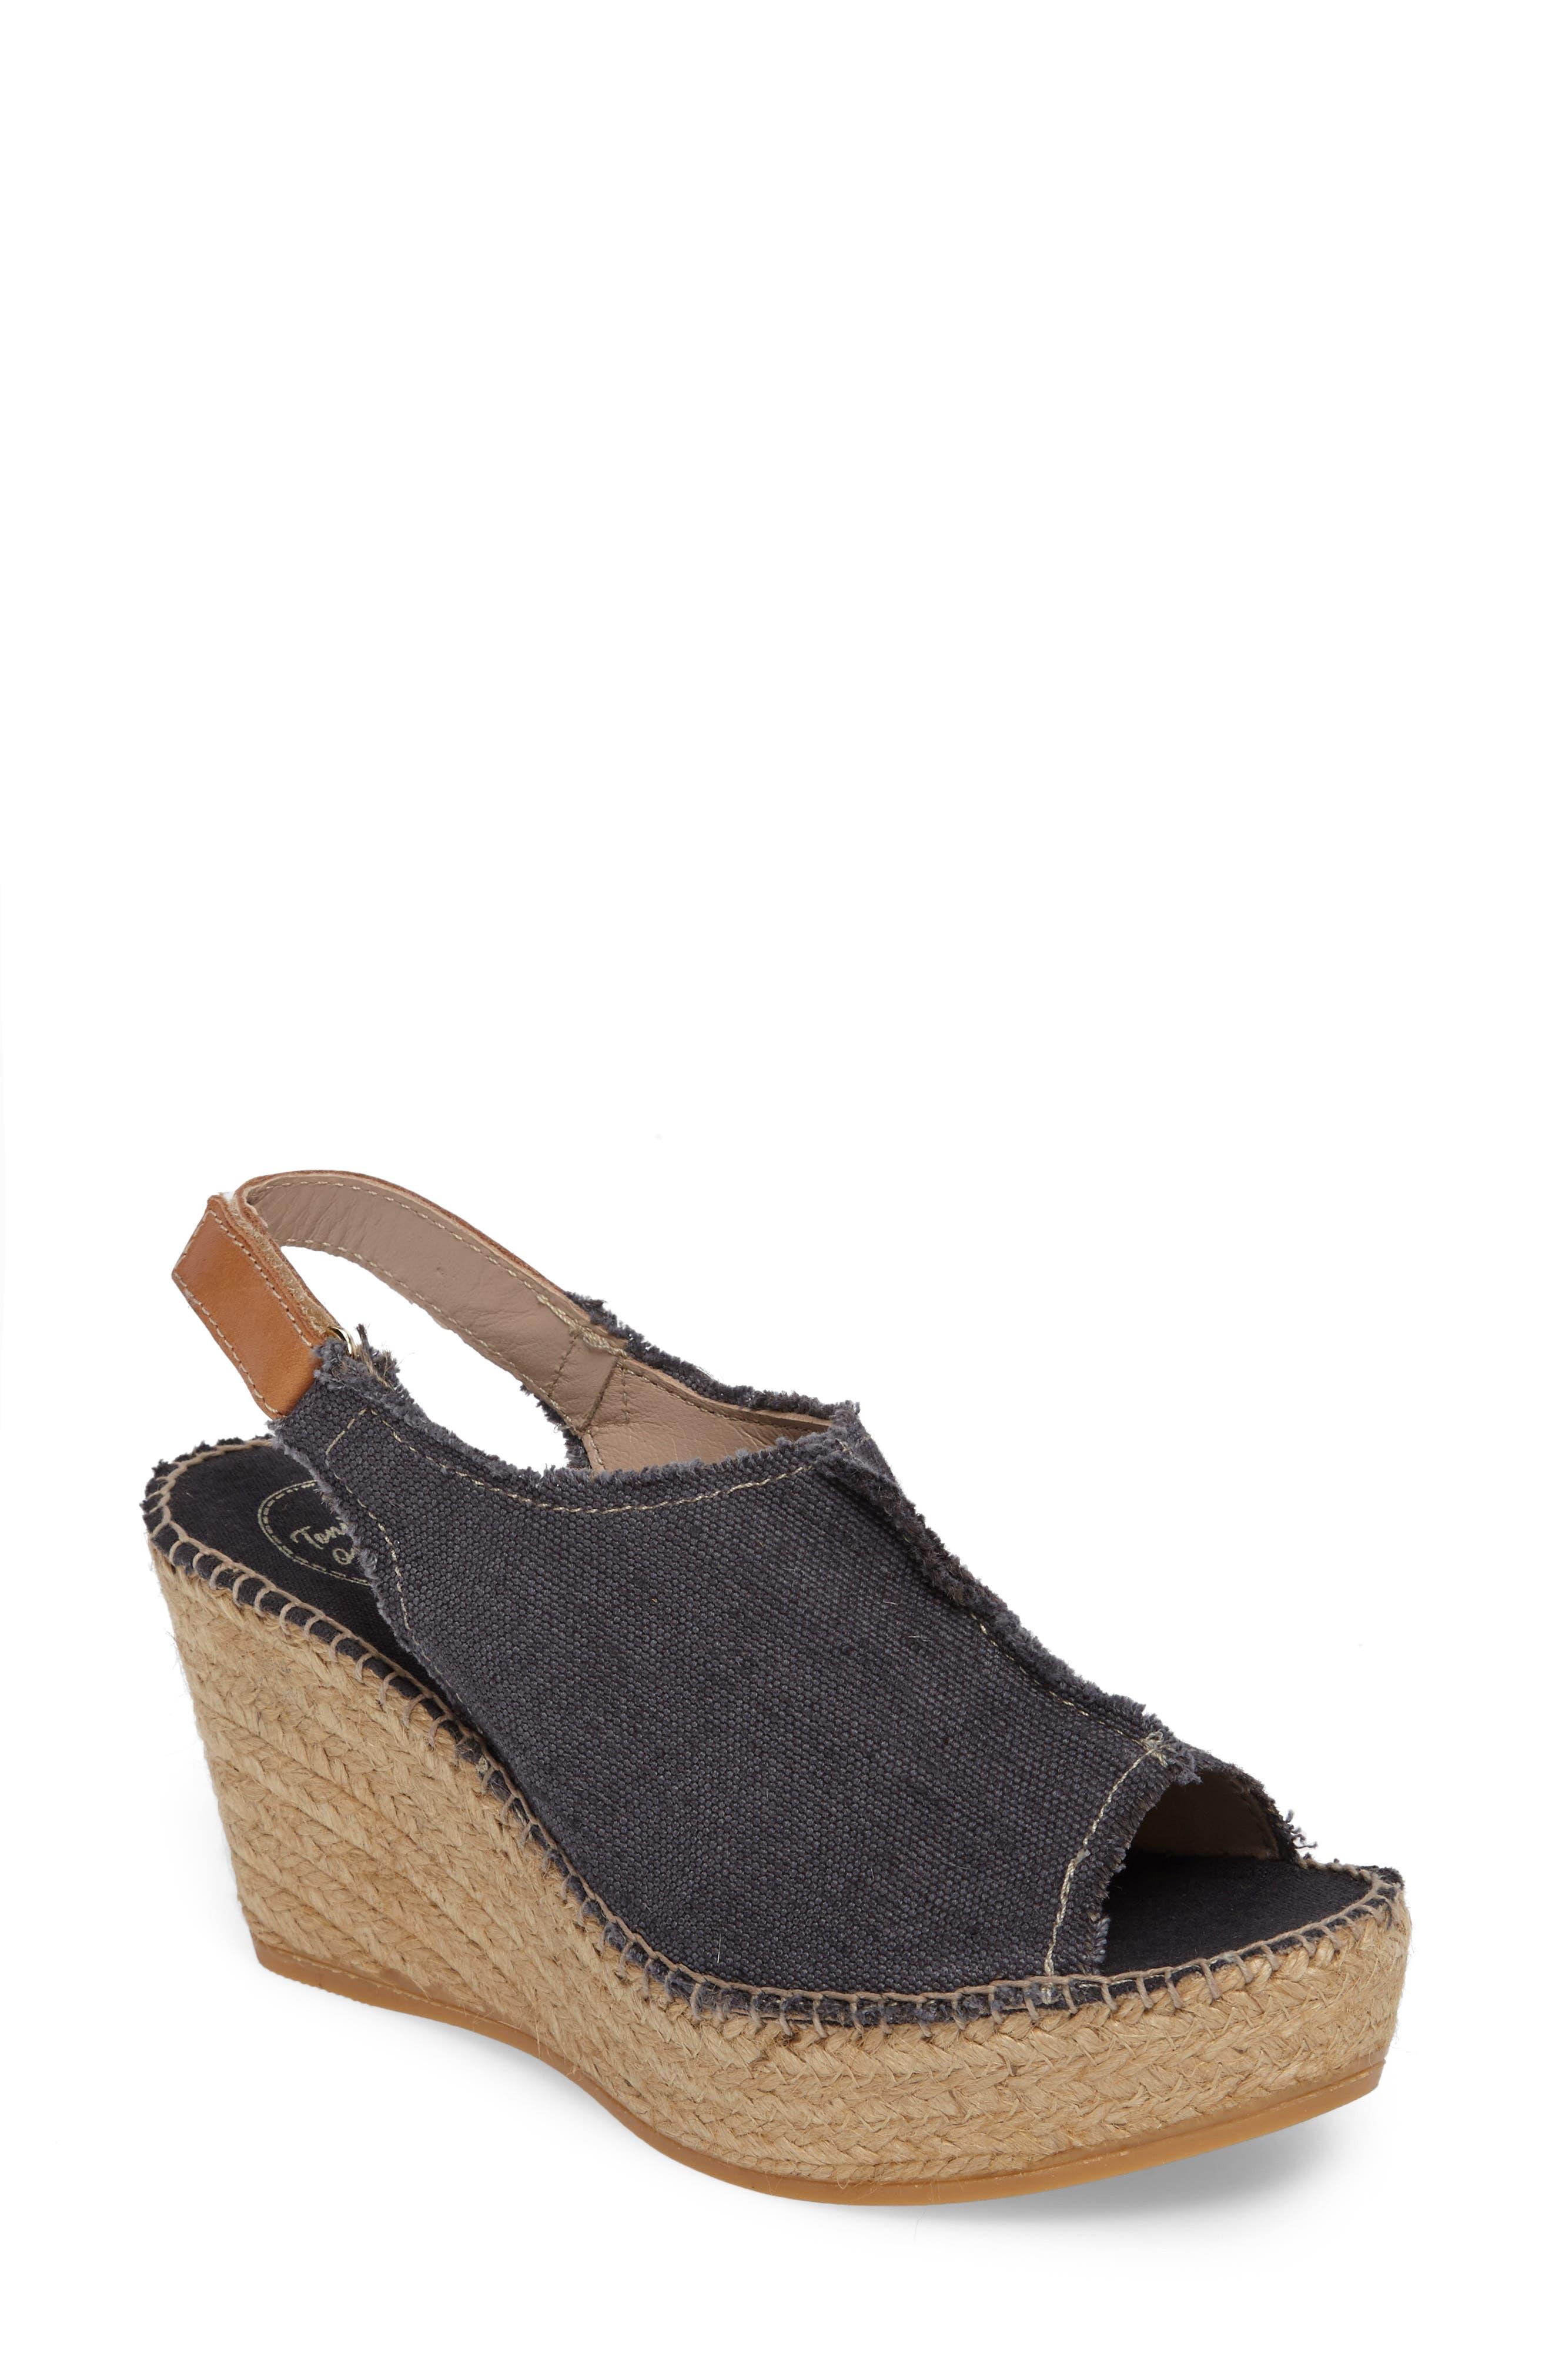 'Lugano' Espadrille Wedge Sandal,                             Main thumbnail 1, color,                             BLACK FABRIC